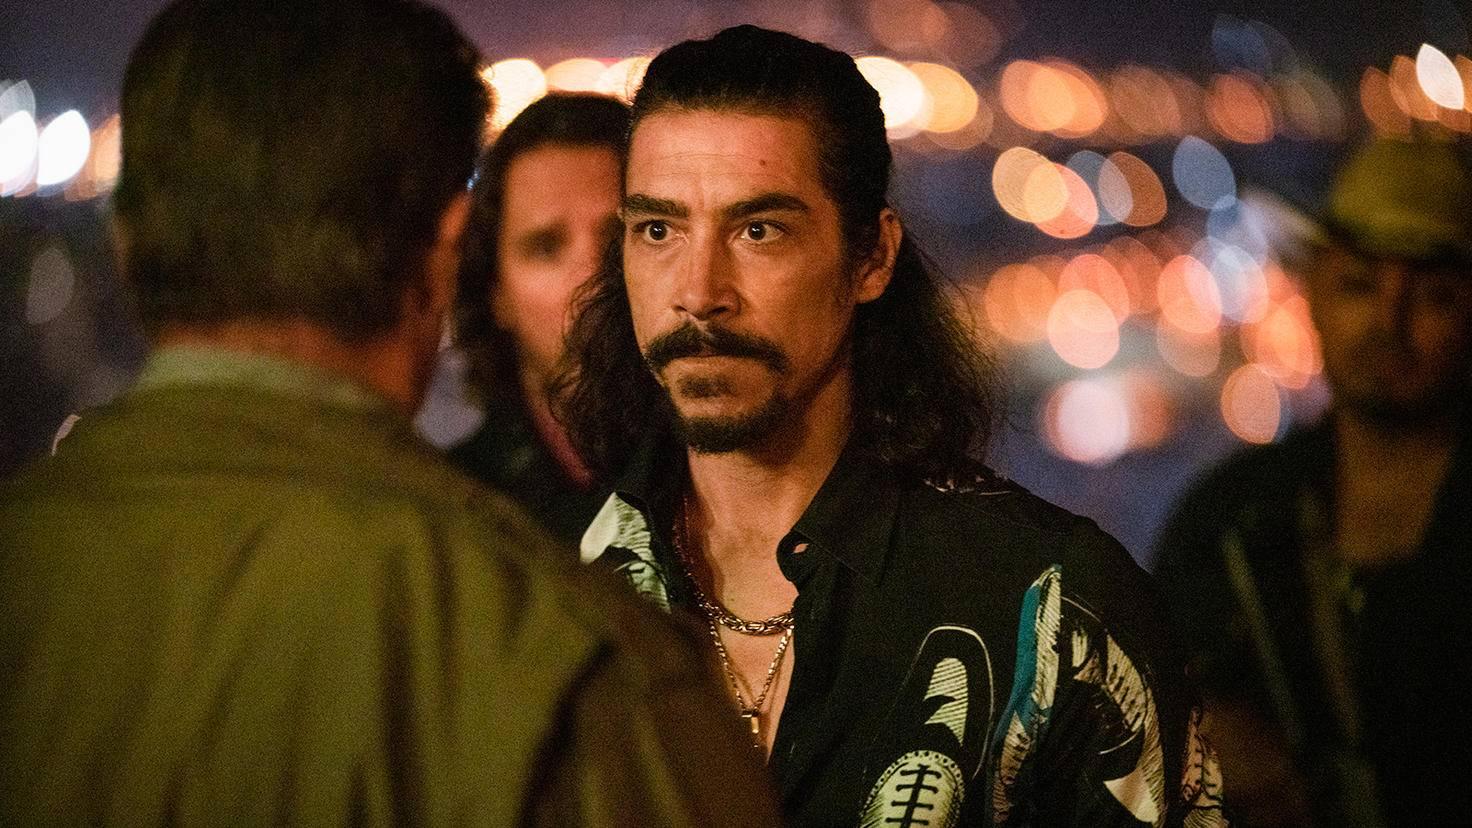 Rambo 5-Oscar Jaenada as Victor Martinez-Yana Blajeva-Lionsgate